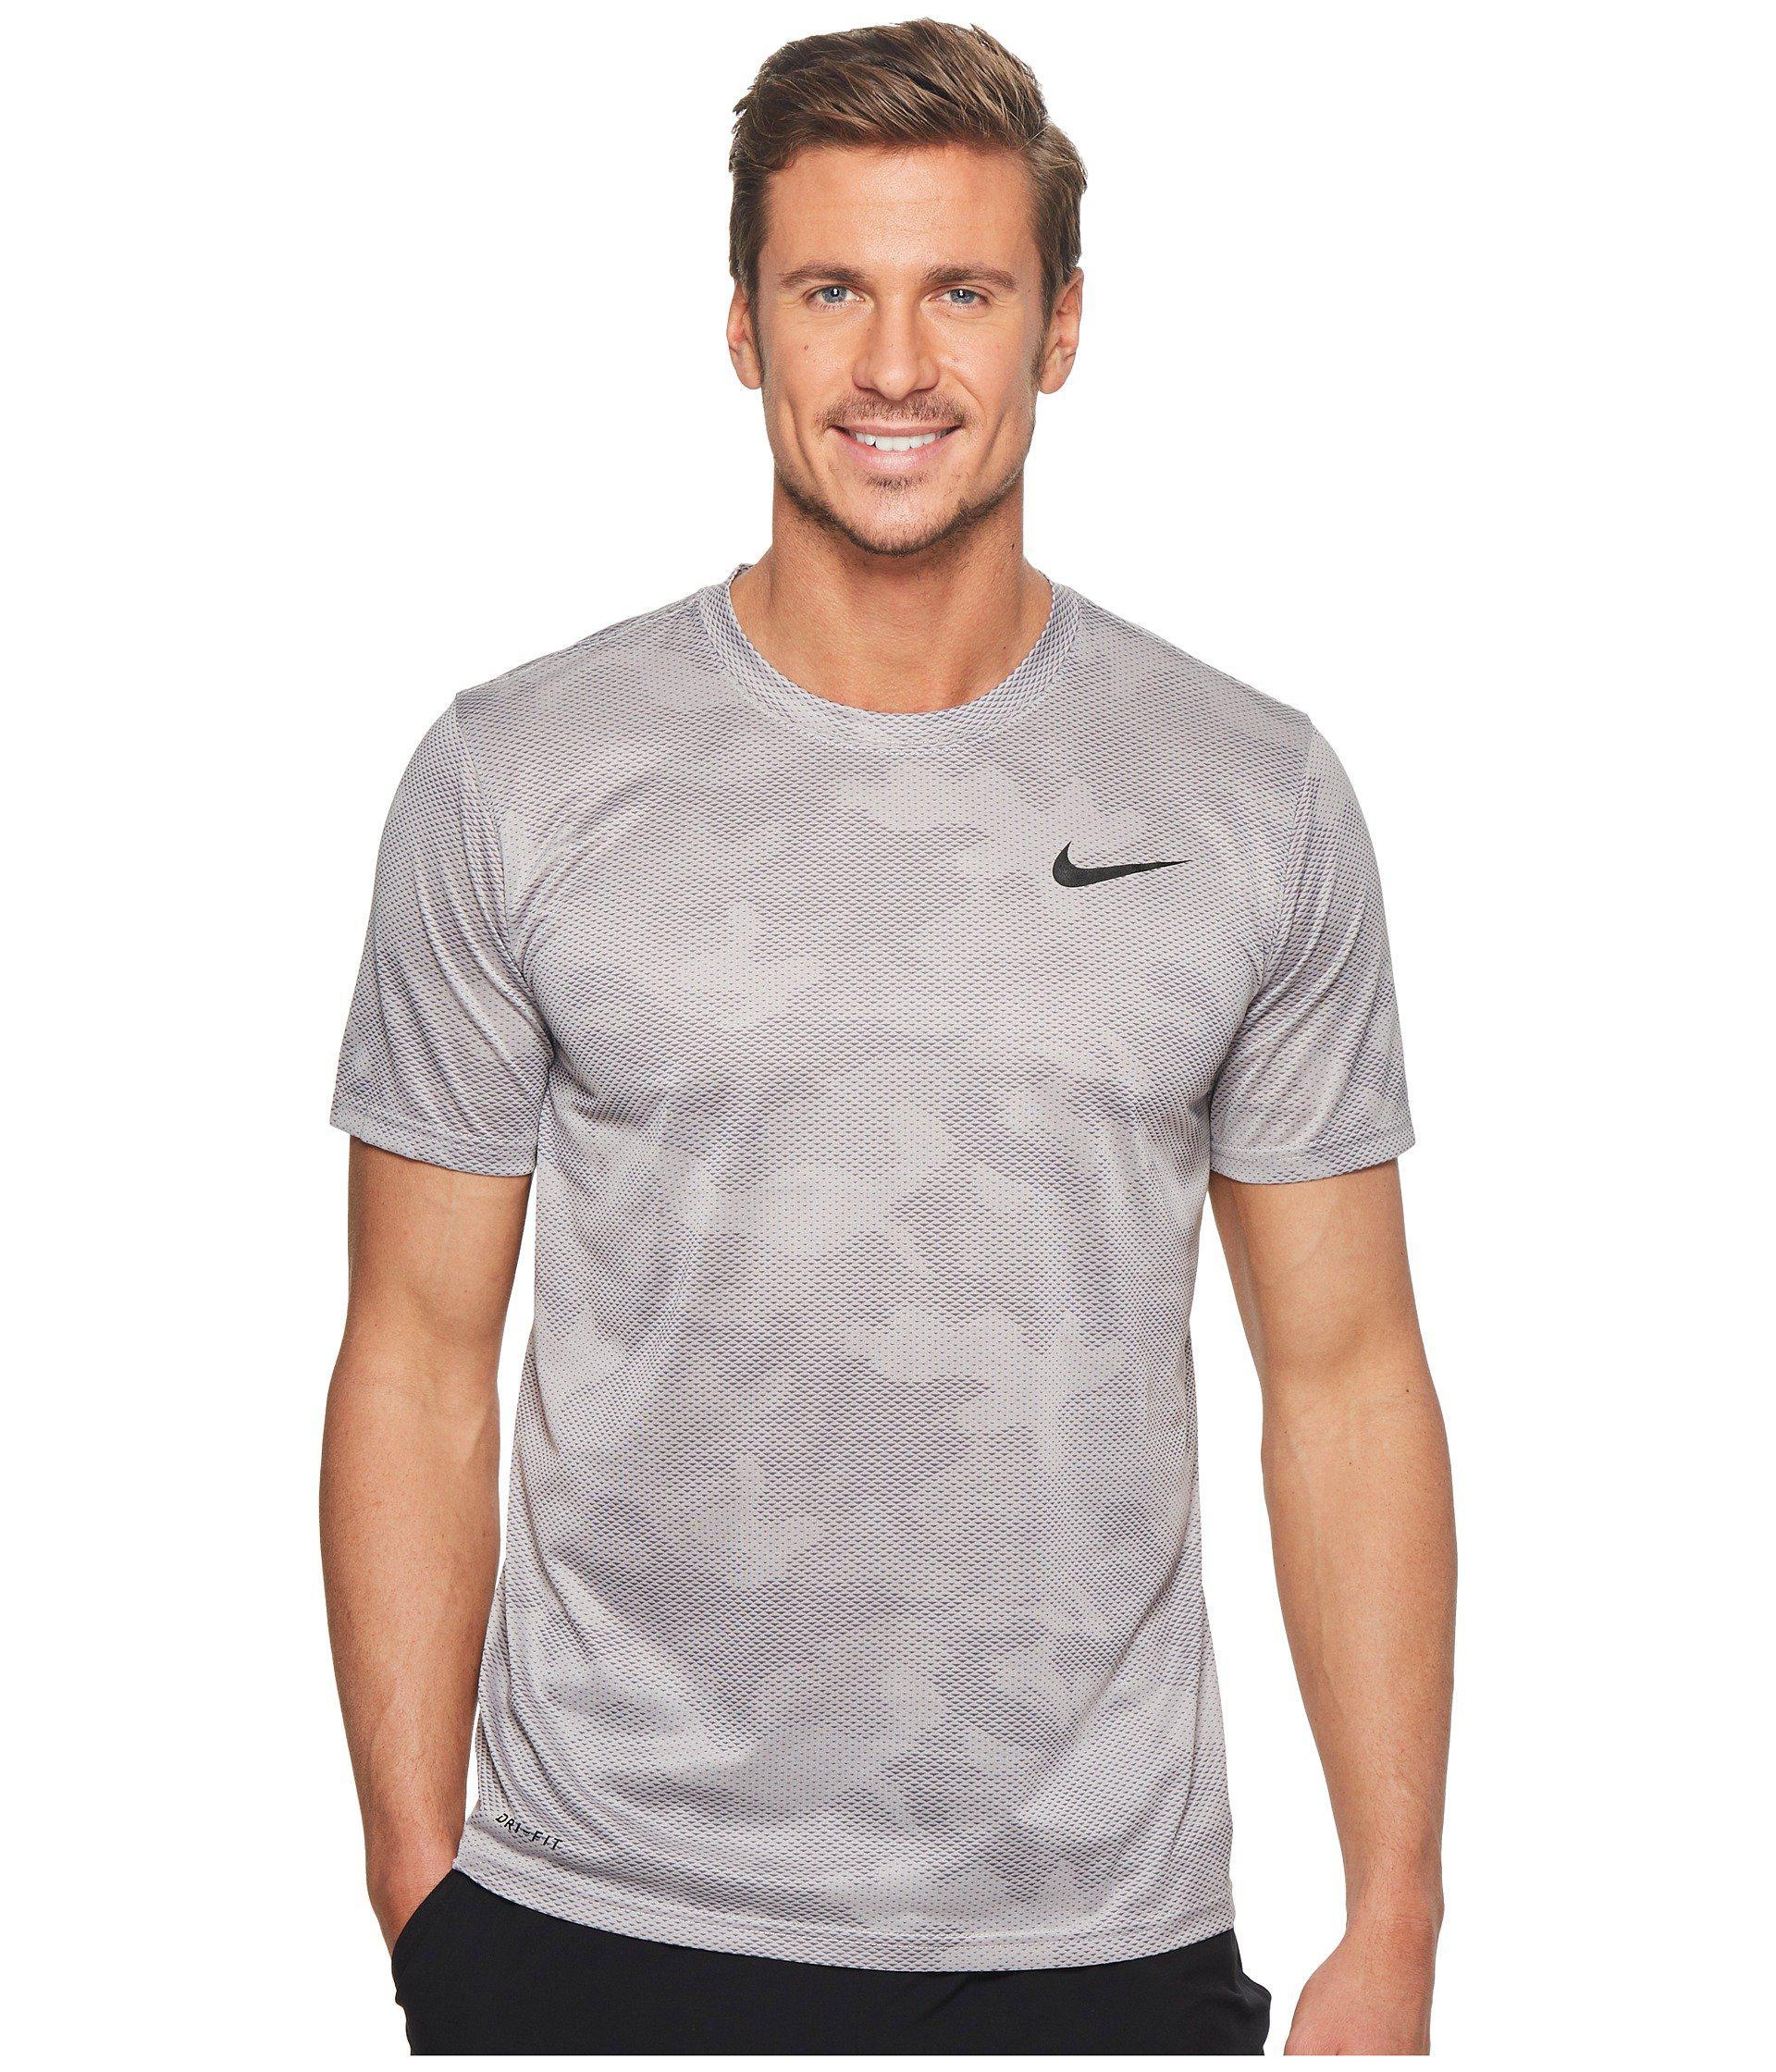 9c5c599b Nike Dry Legend Training T-shirt (atmosphere Grey/gunsmoke) Men's T ...